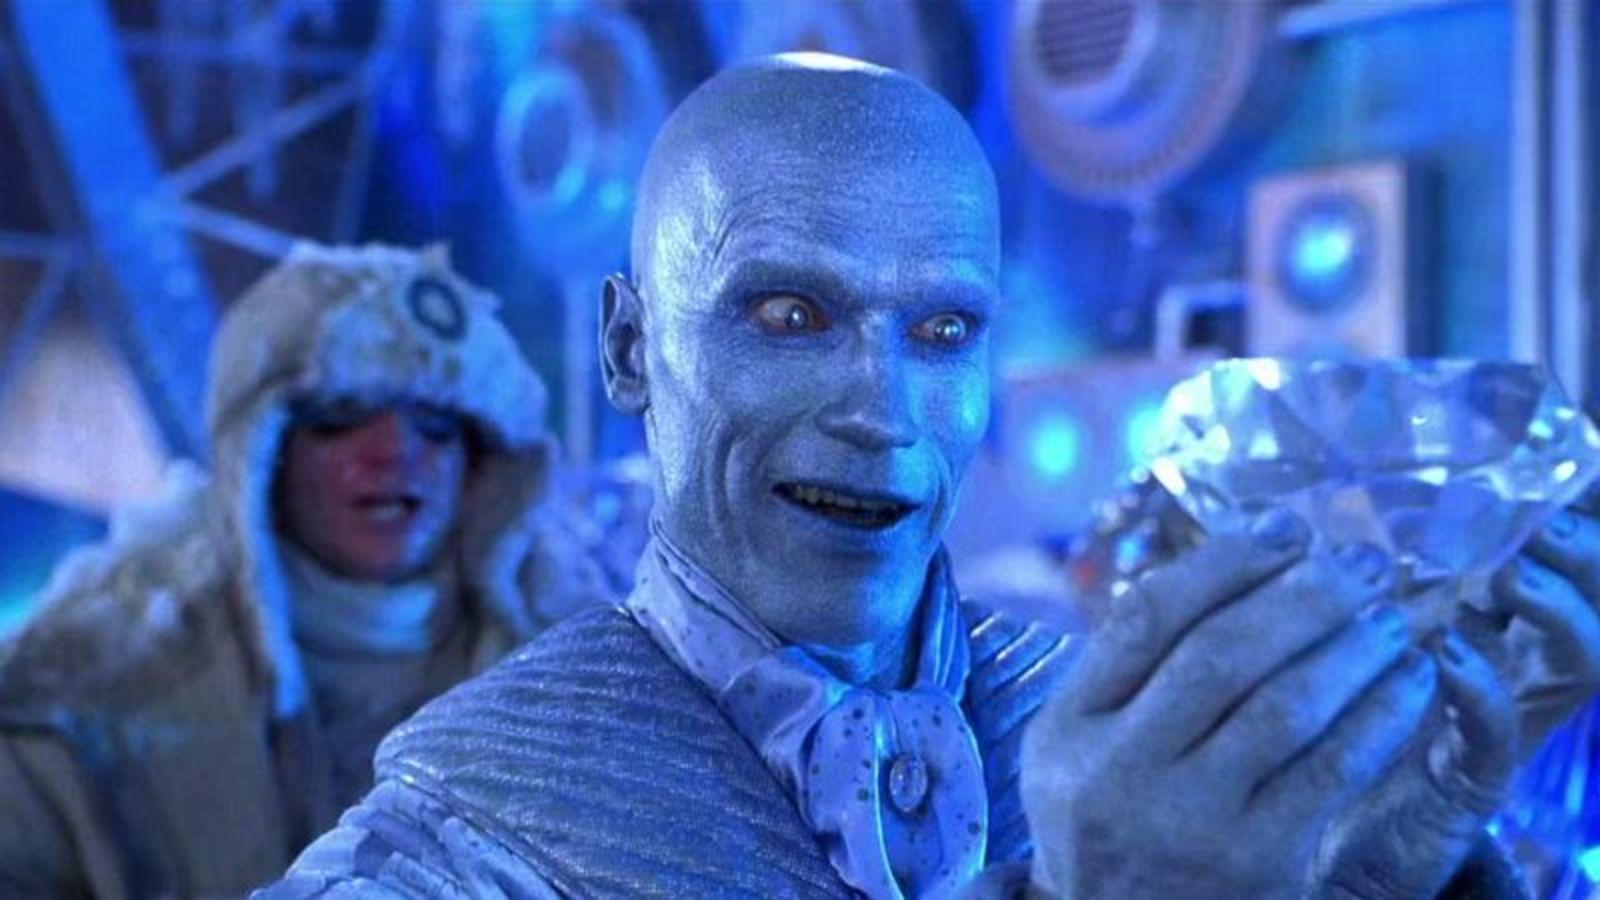 Top 10 Arnie Puns Mr. Freeze